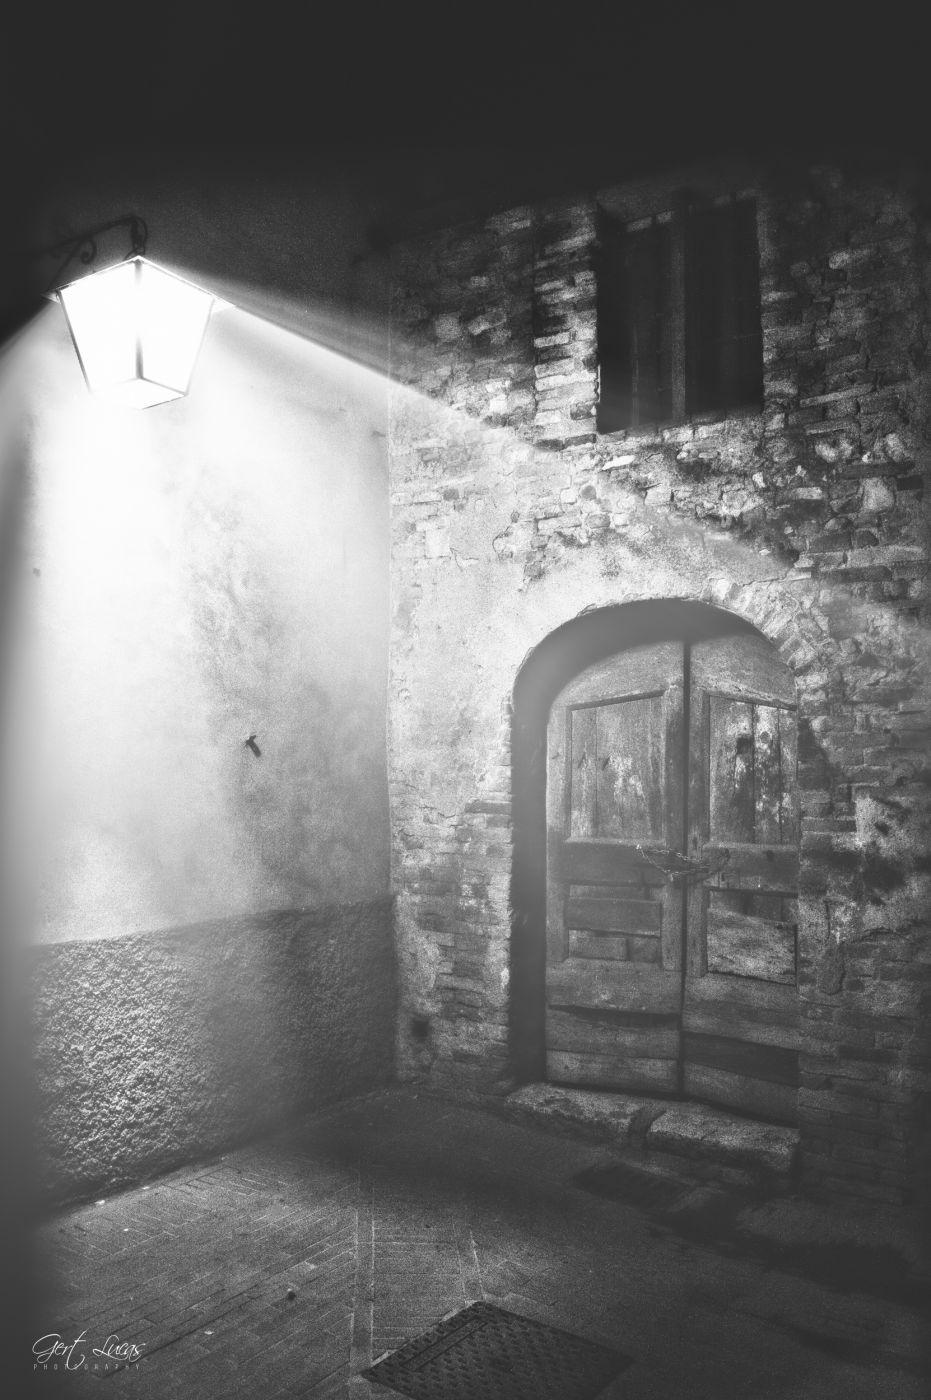 San Gimignano - Quiet corner, Italy